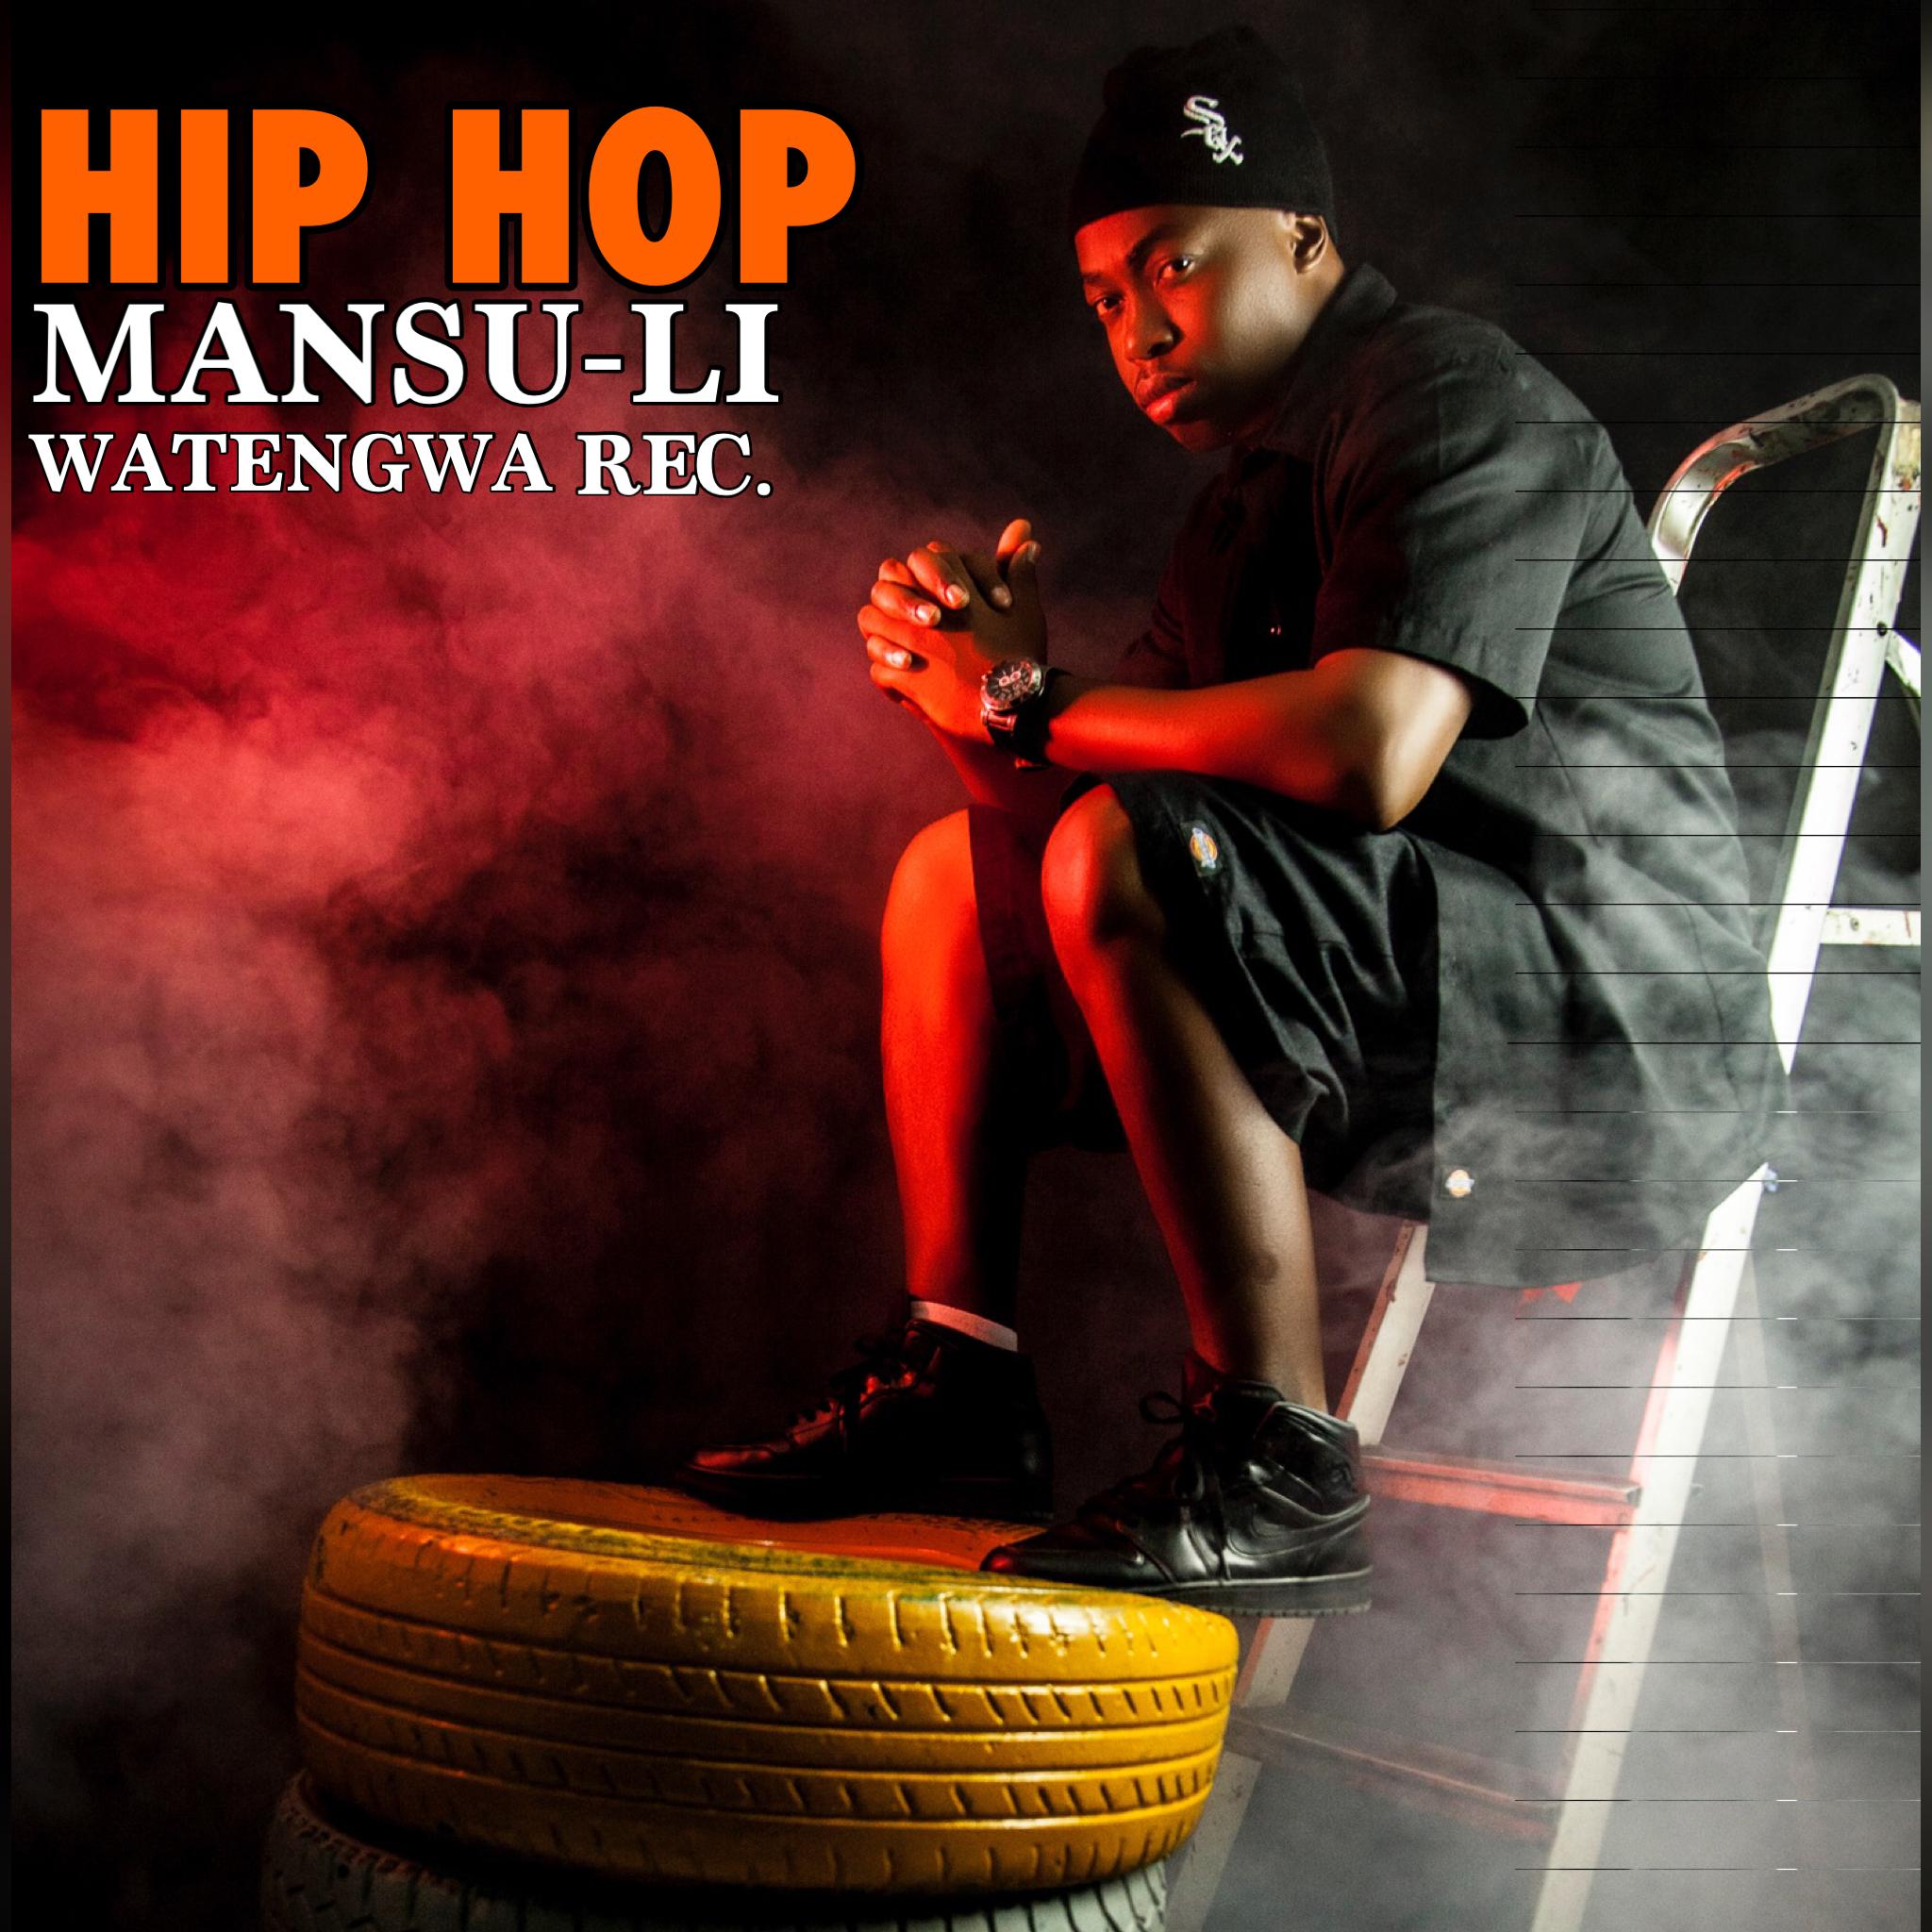 MANSU-LI - Bado tupo ft. Aveli/Godzilla